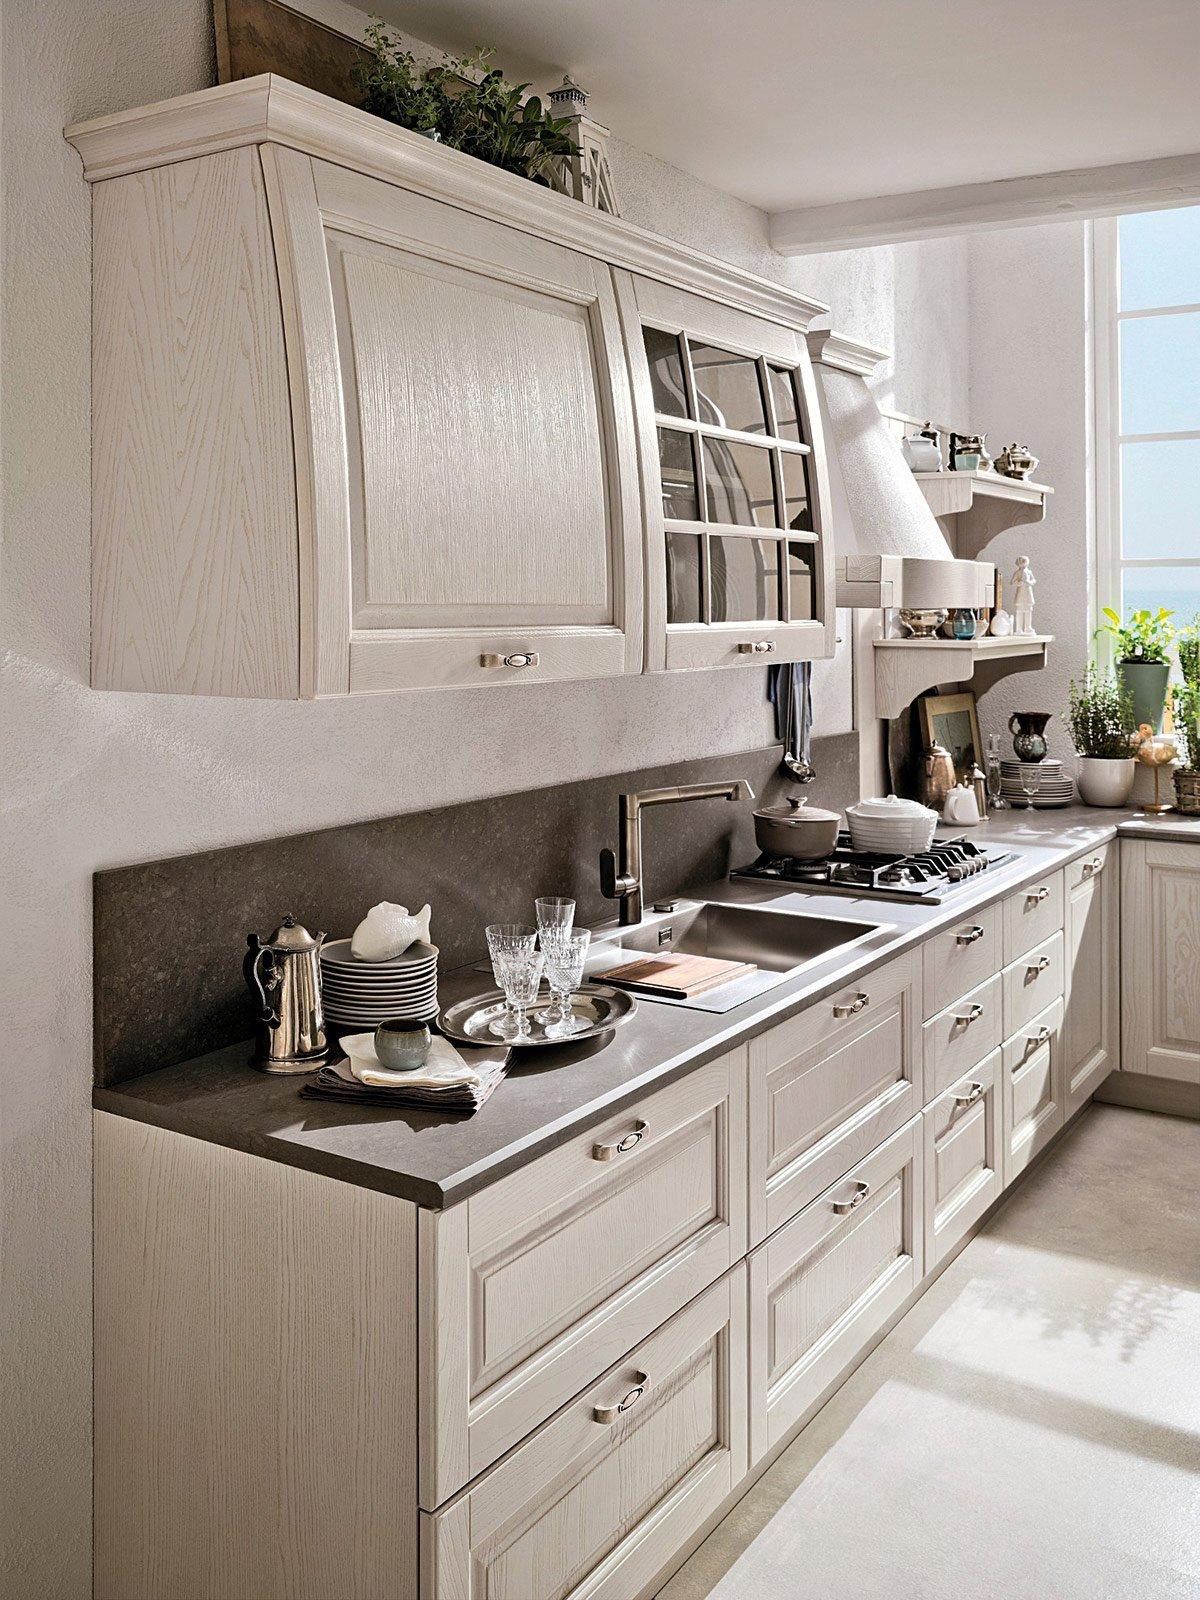 Cucine country stile tradizionale o new classic cose di casa - Profondita pensili cucina ...